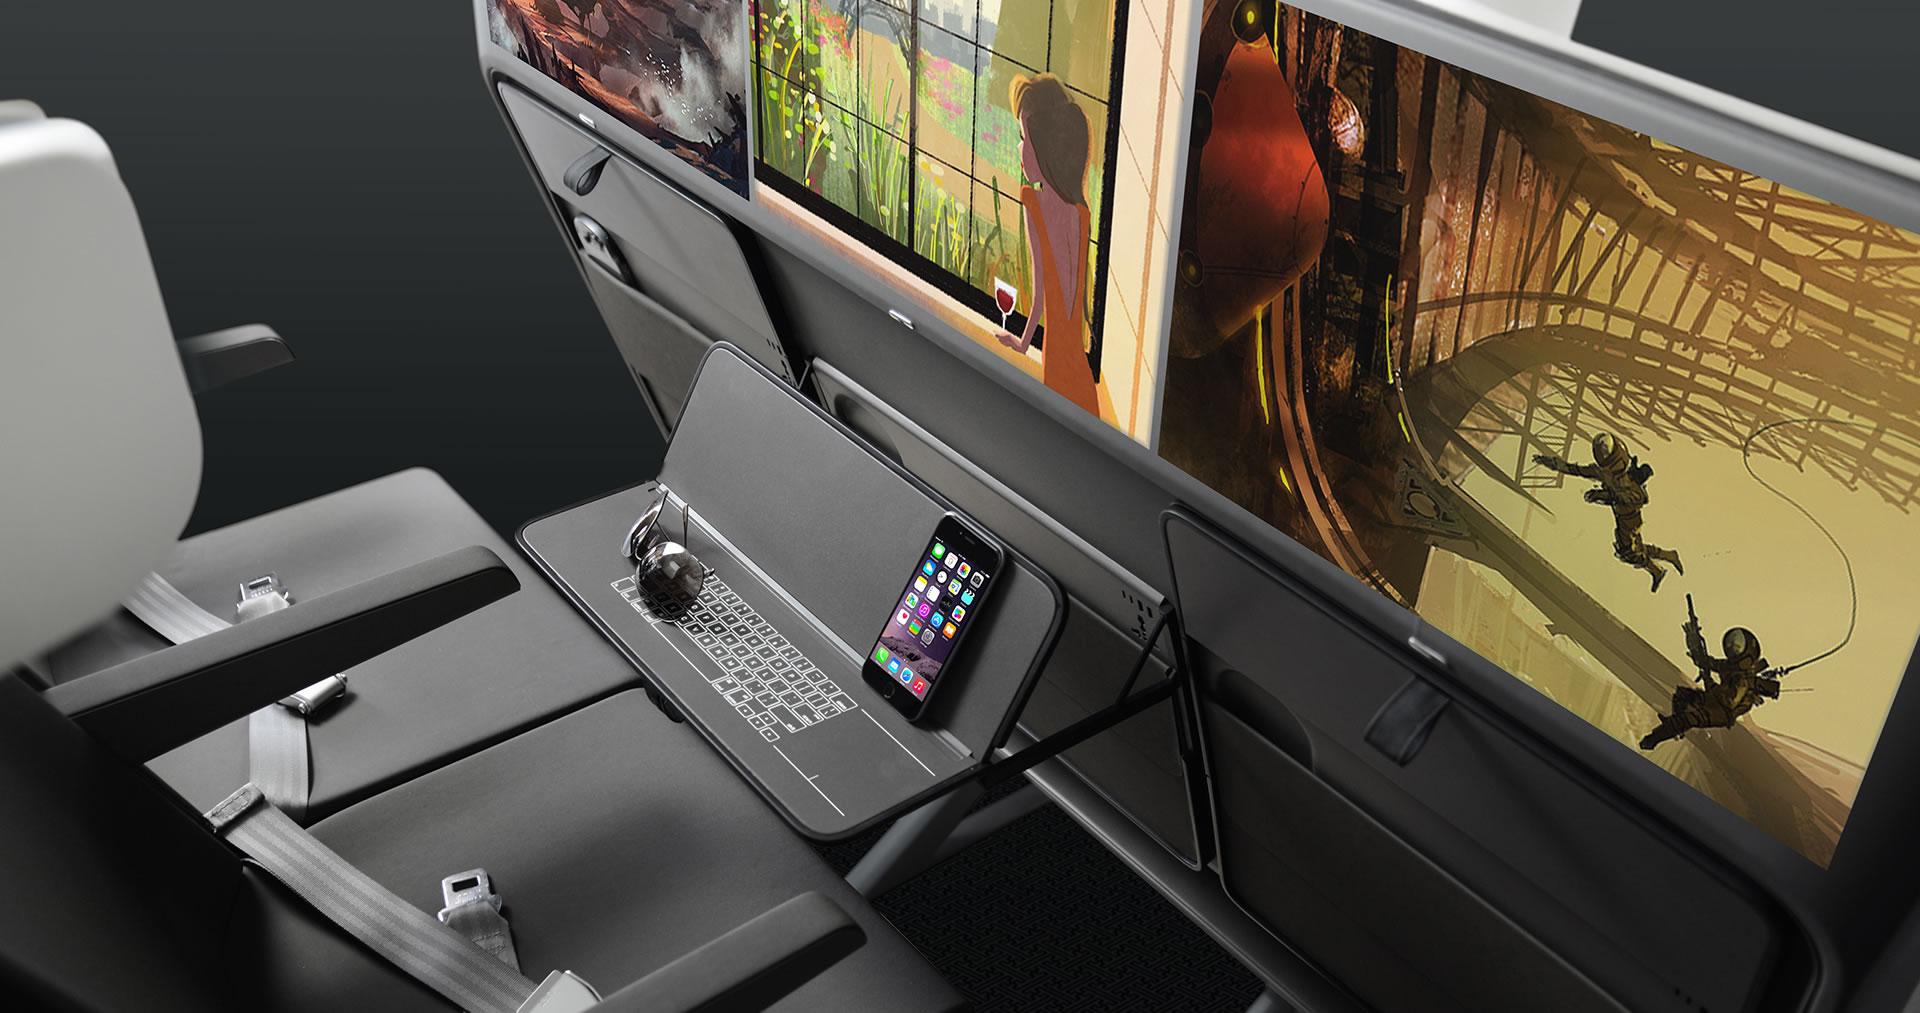 AirCom Pacific airplane seats folding table design